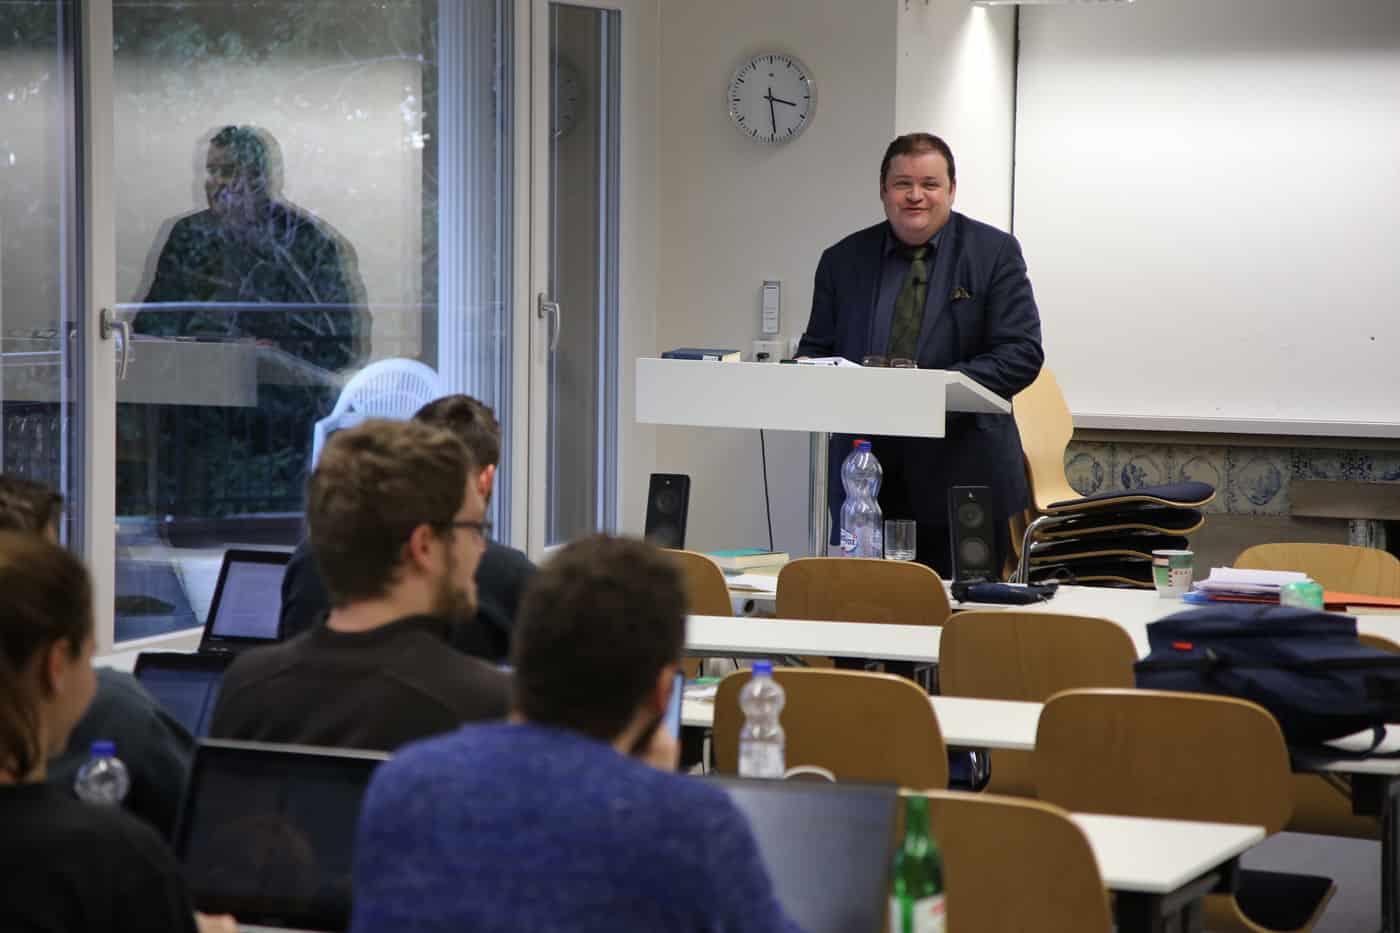 Sth Basel Argumentationstraining 2018 10